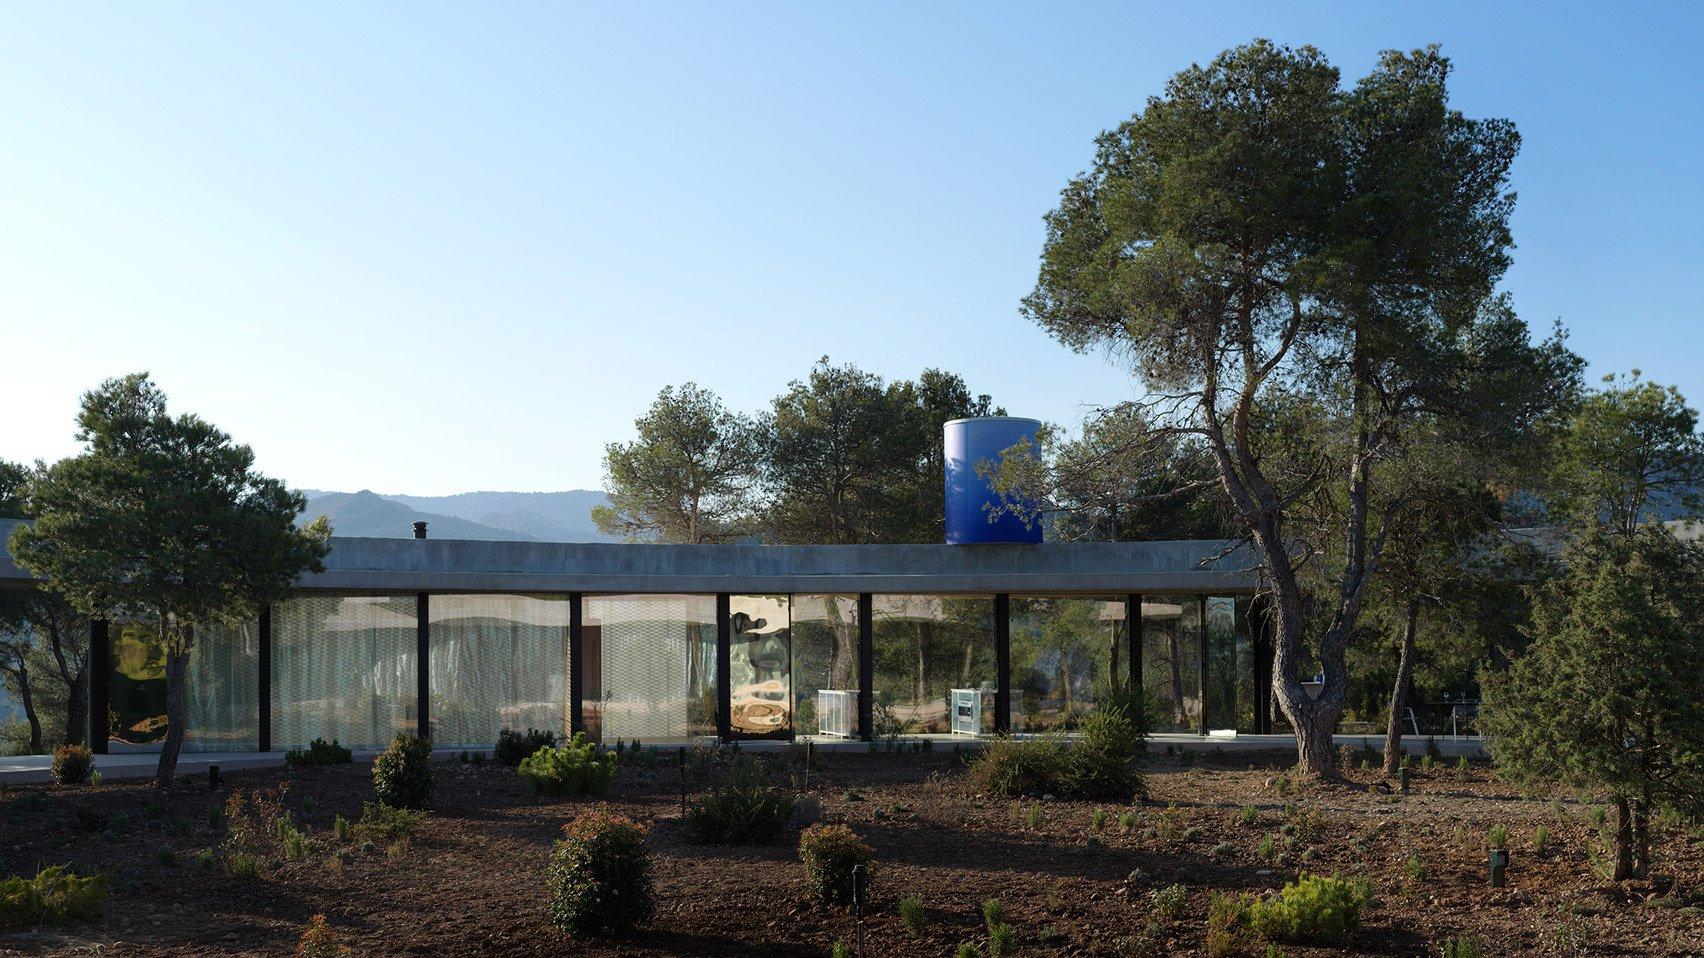 2. Solo House II by Office KGDVS in Matarraña Teruel - Solo House II by Office KGDVS encircles forested hilltop in Matarraña, Teruel